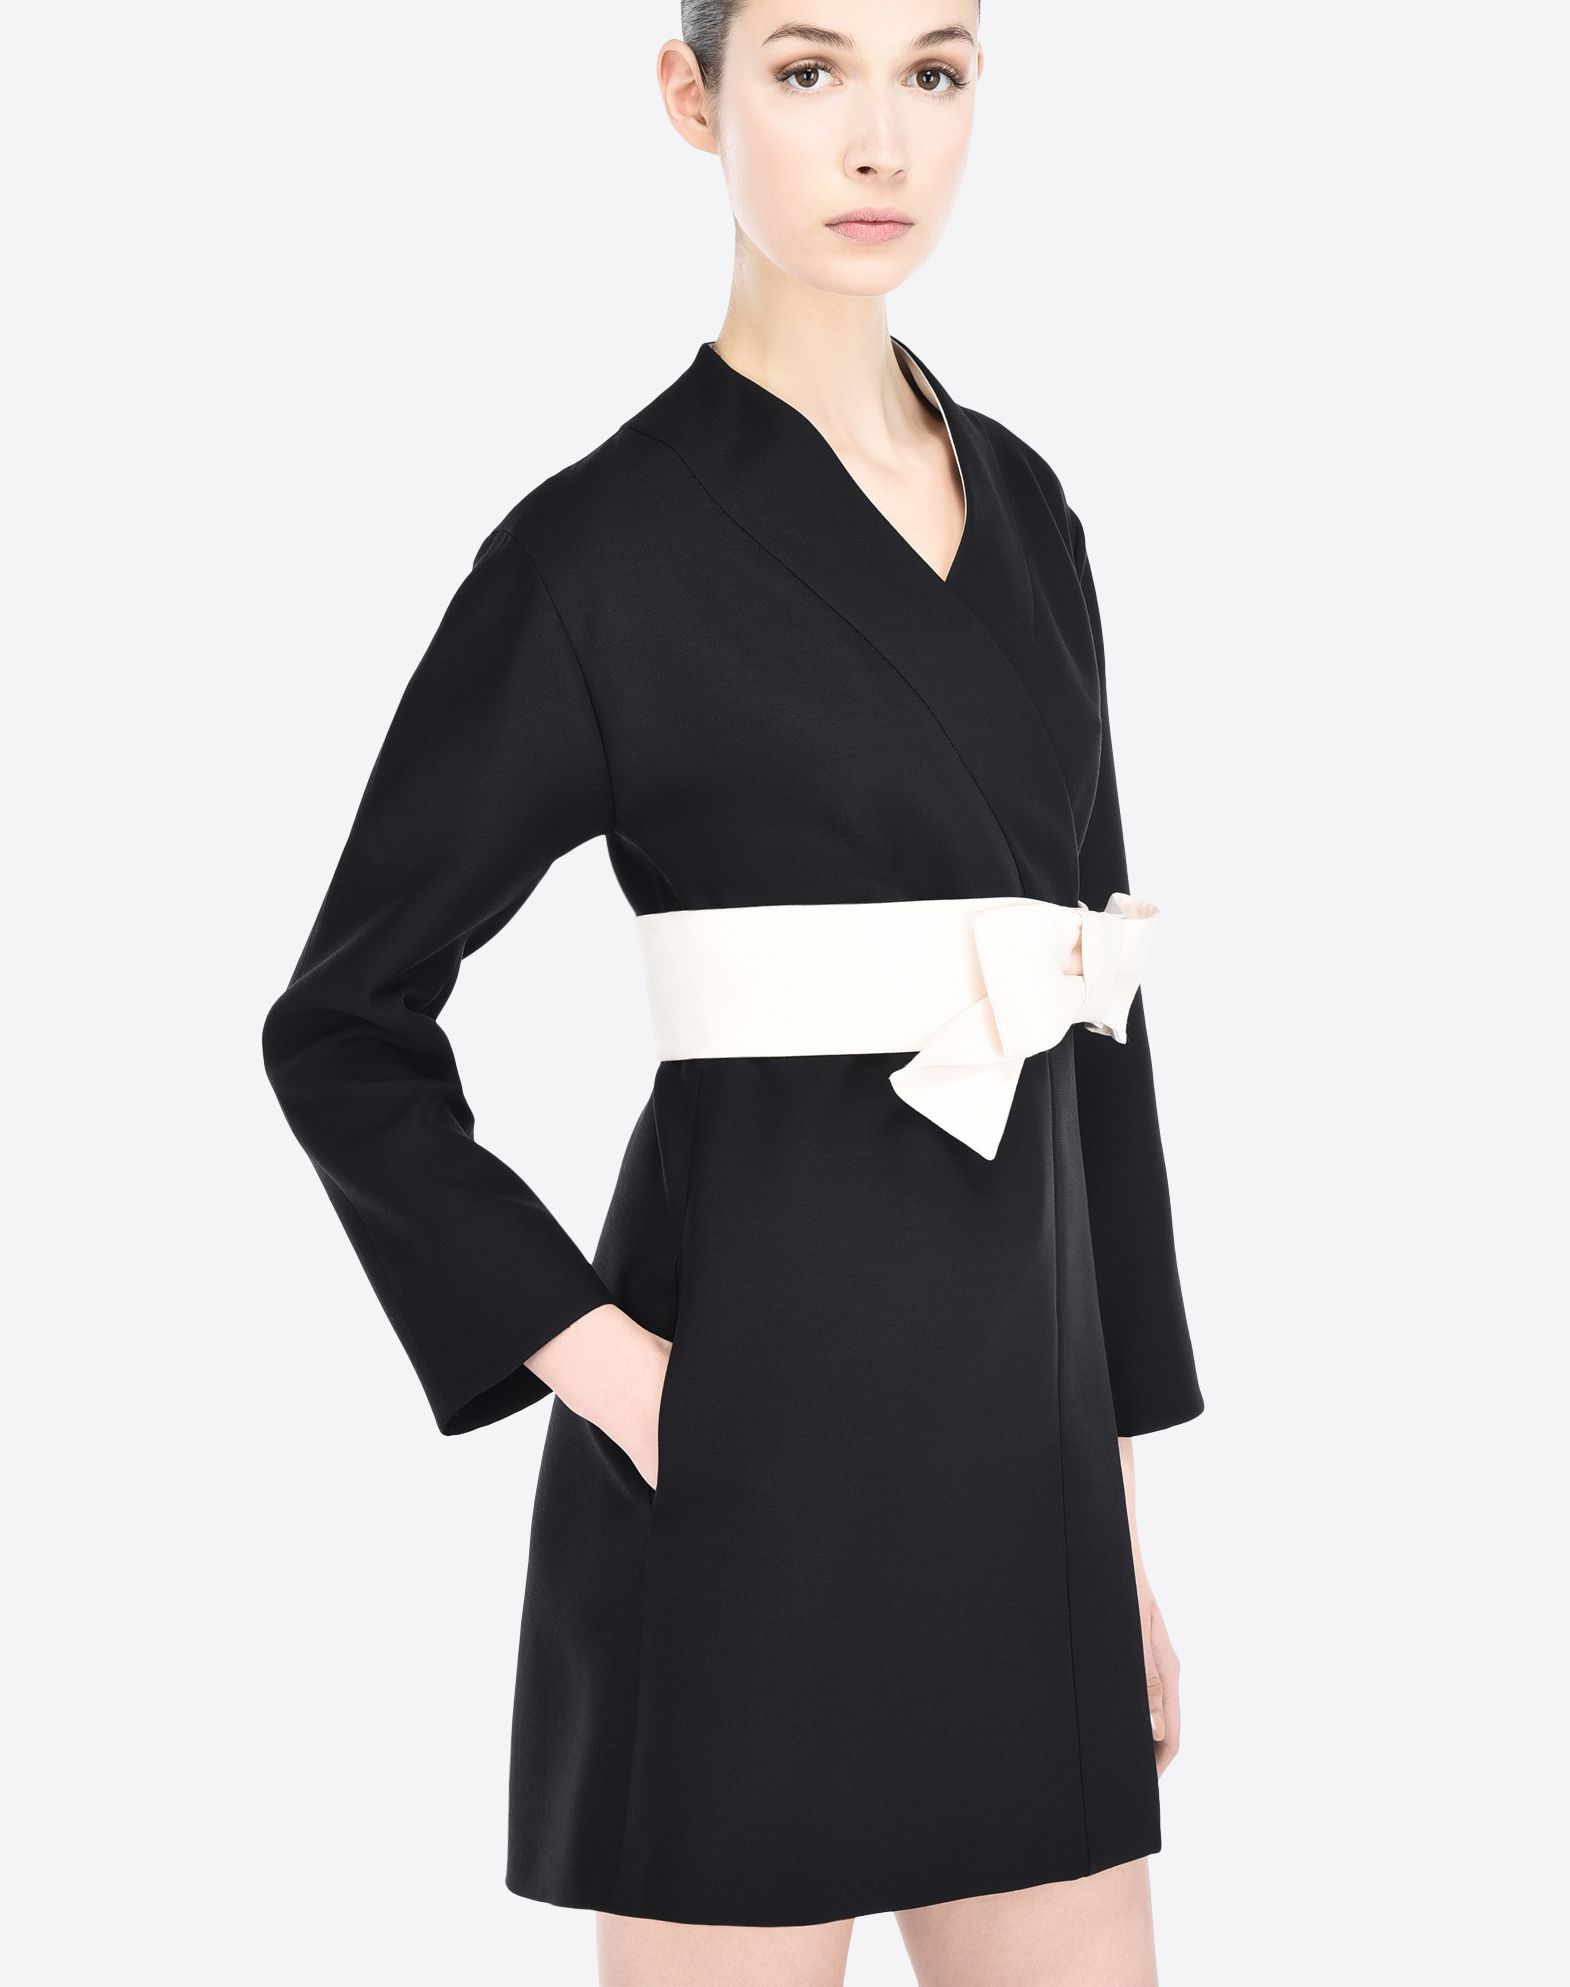 VALENTINO Bow detailing Belt Crêpe Solid colour V-neckline Button closing Side pockets Lined interior Long sleeves  34629878fg